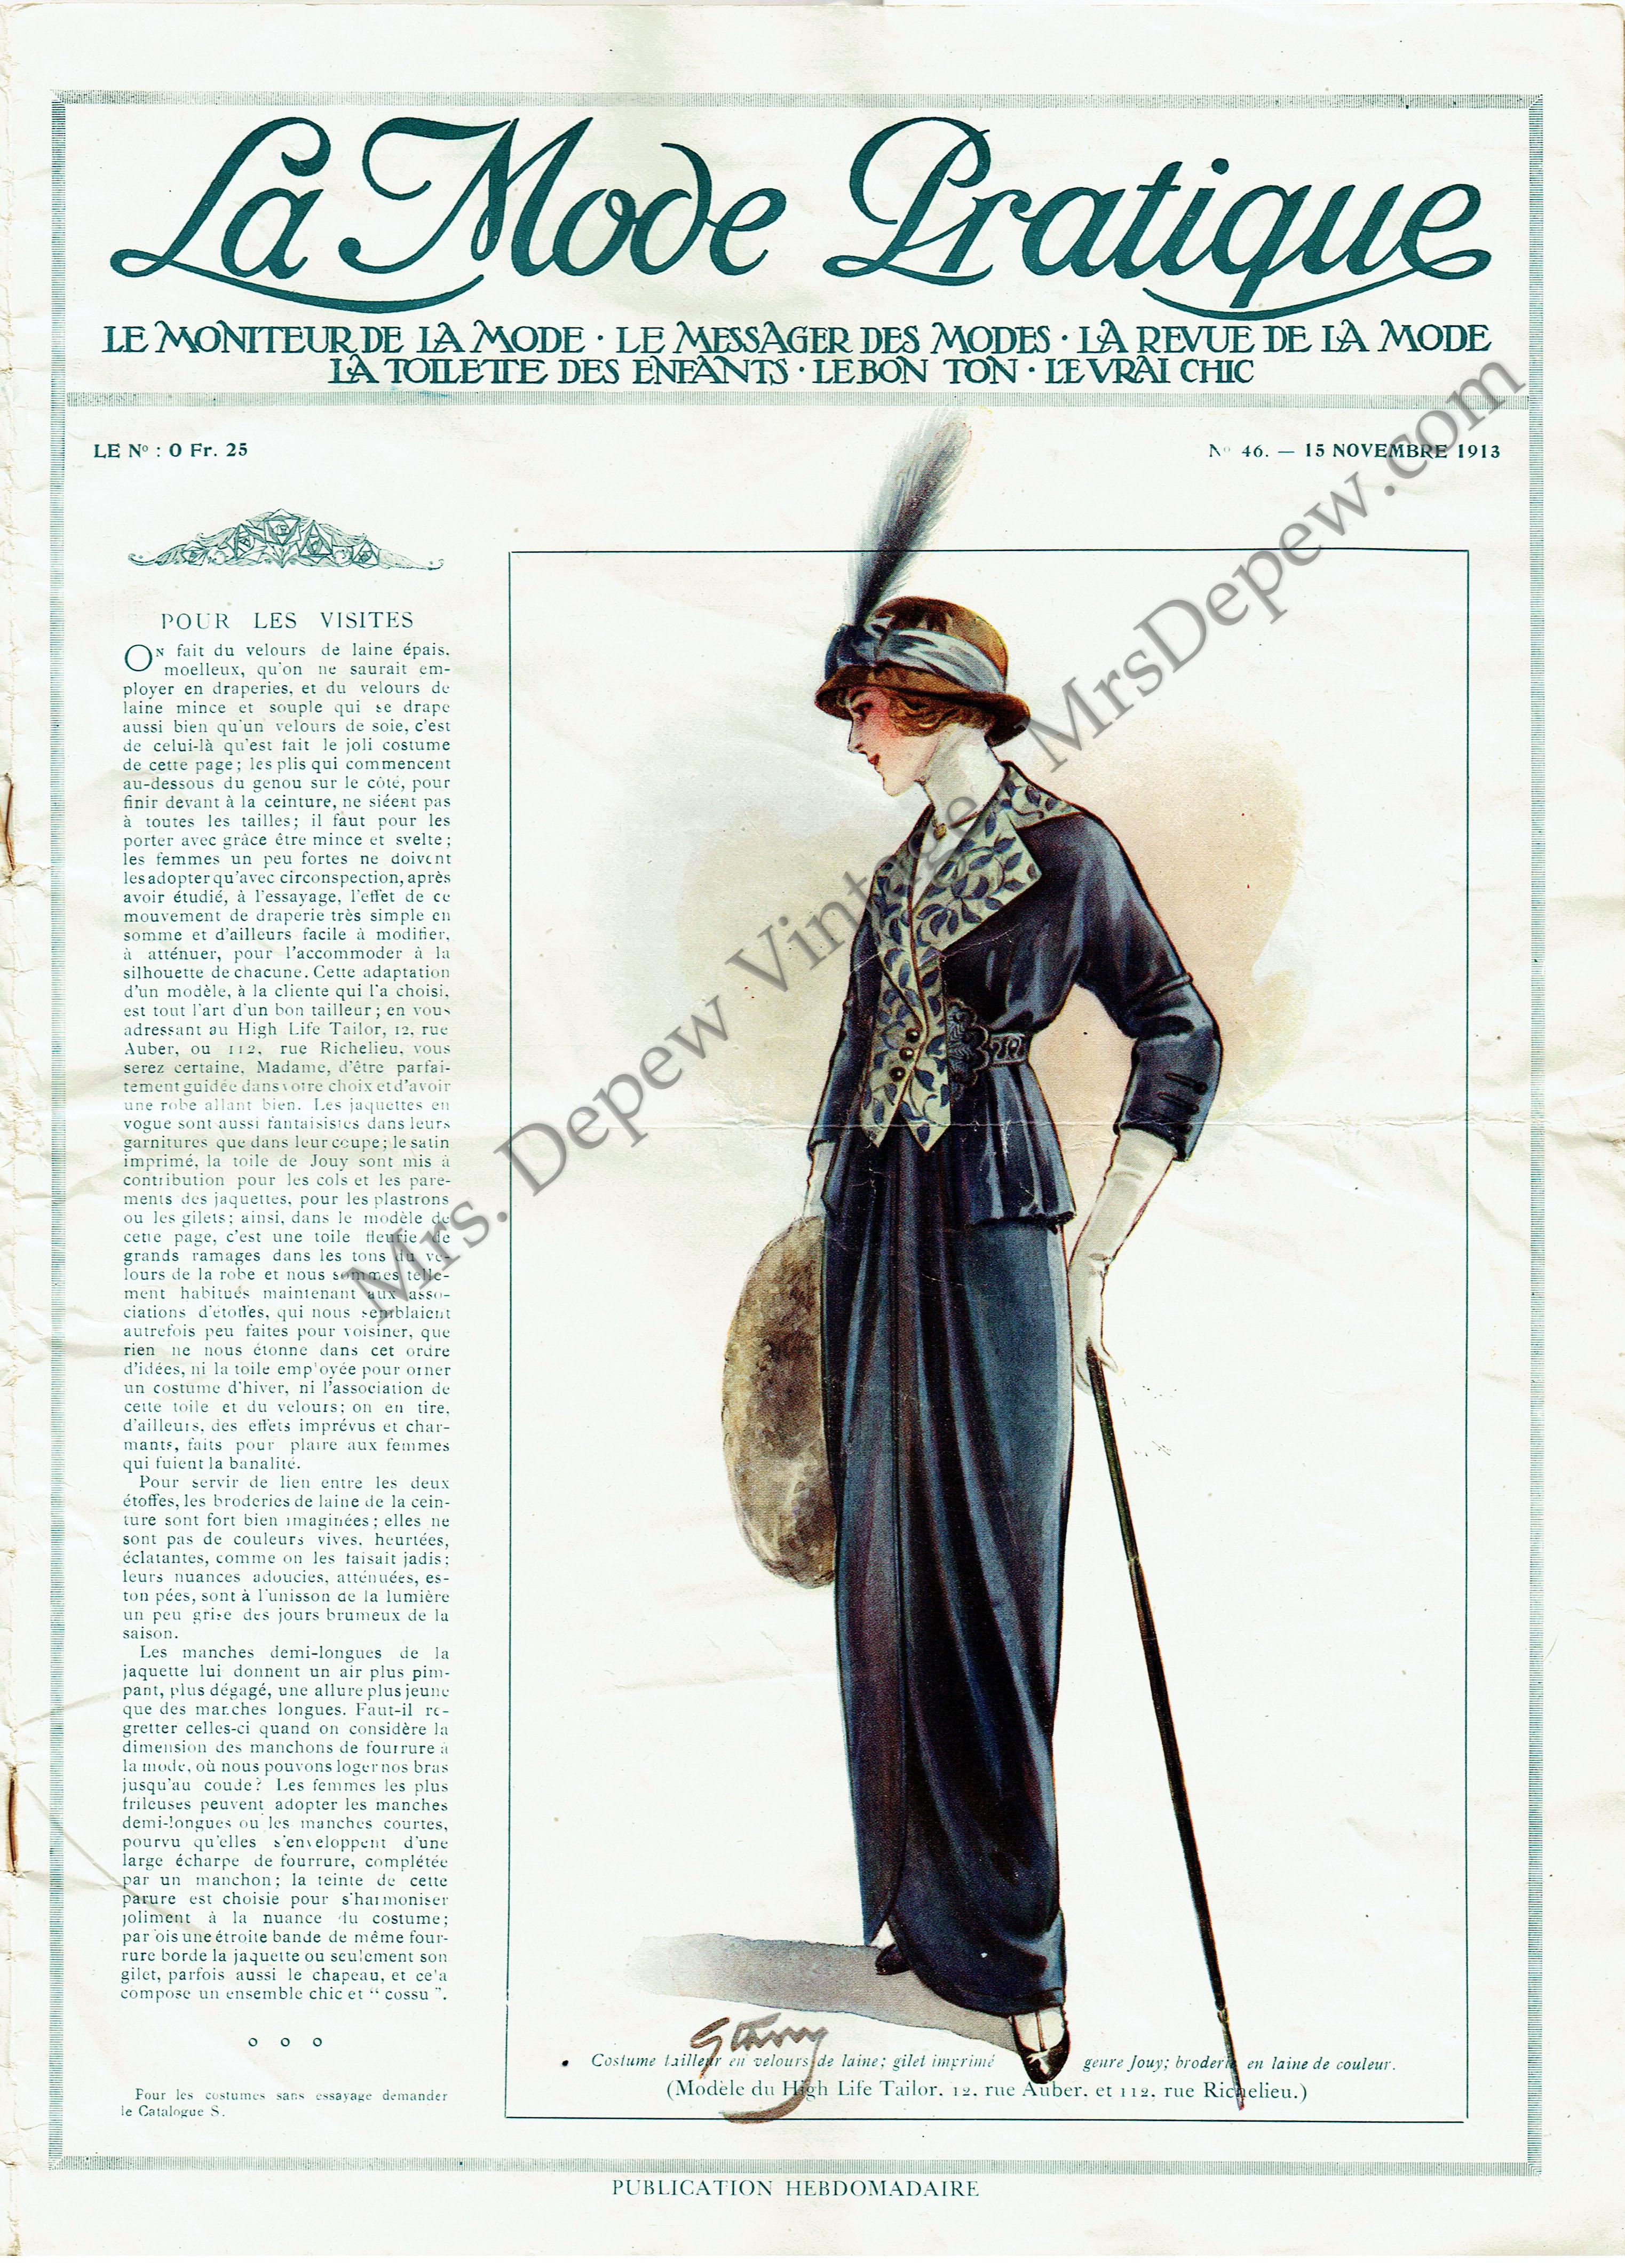 La Mode Pratique No. 46 15 Novembre 1913